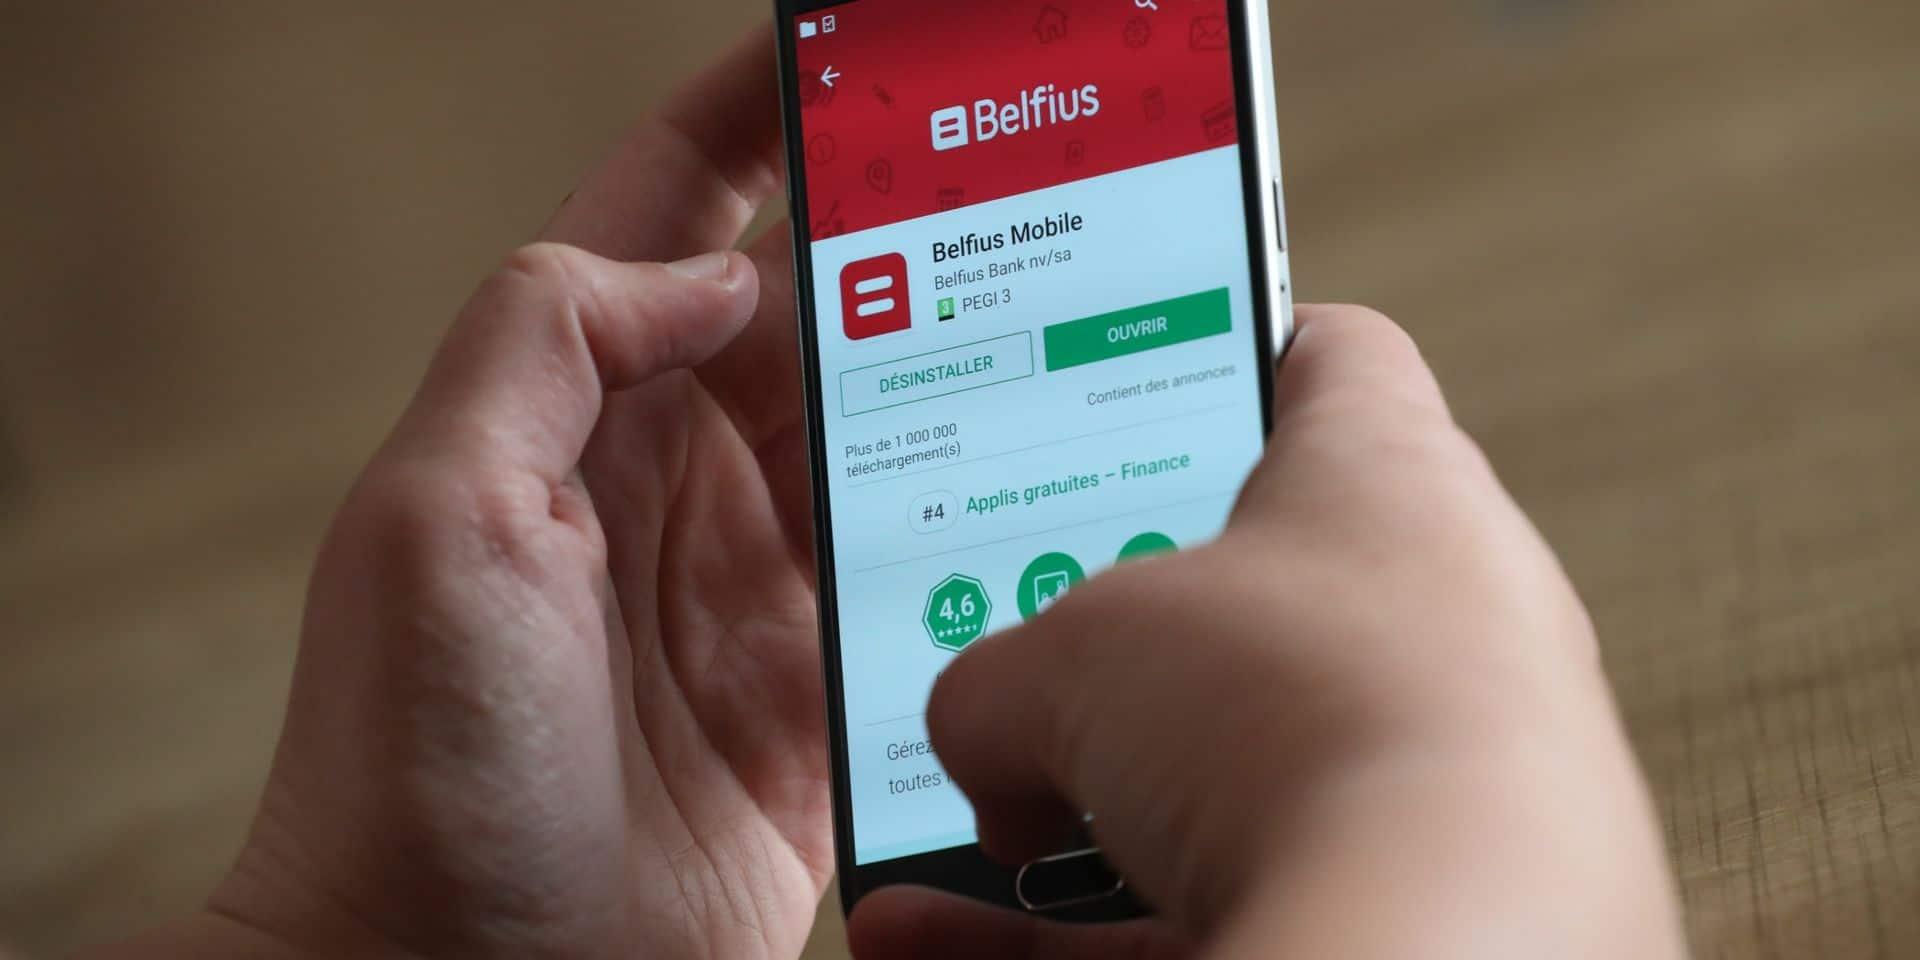 La banque Belfius va augmenter une série de ses tarifs